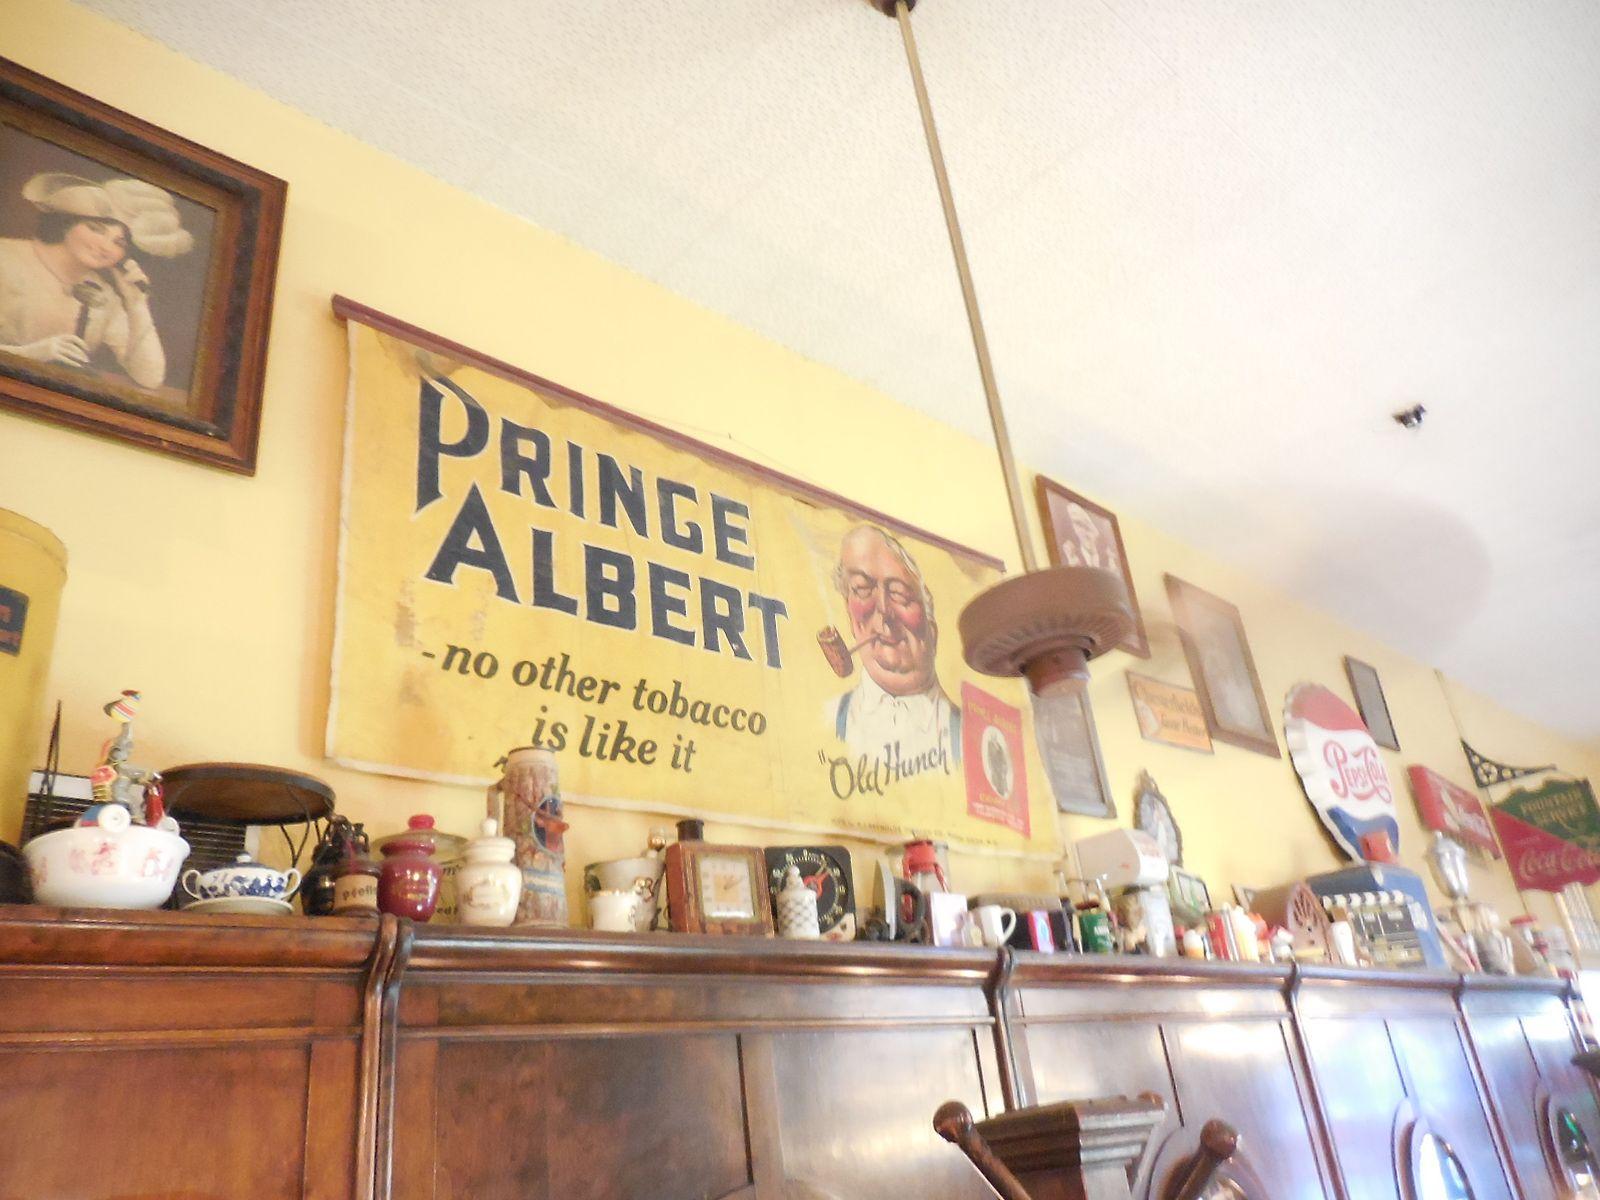 Macalpine S Historic Soda Shop And Antique Store In Phoenix Features Retro Food Shakes Egg Creams And Retro Shopp Retro Recipes Antique Stores The Originals